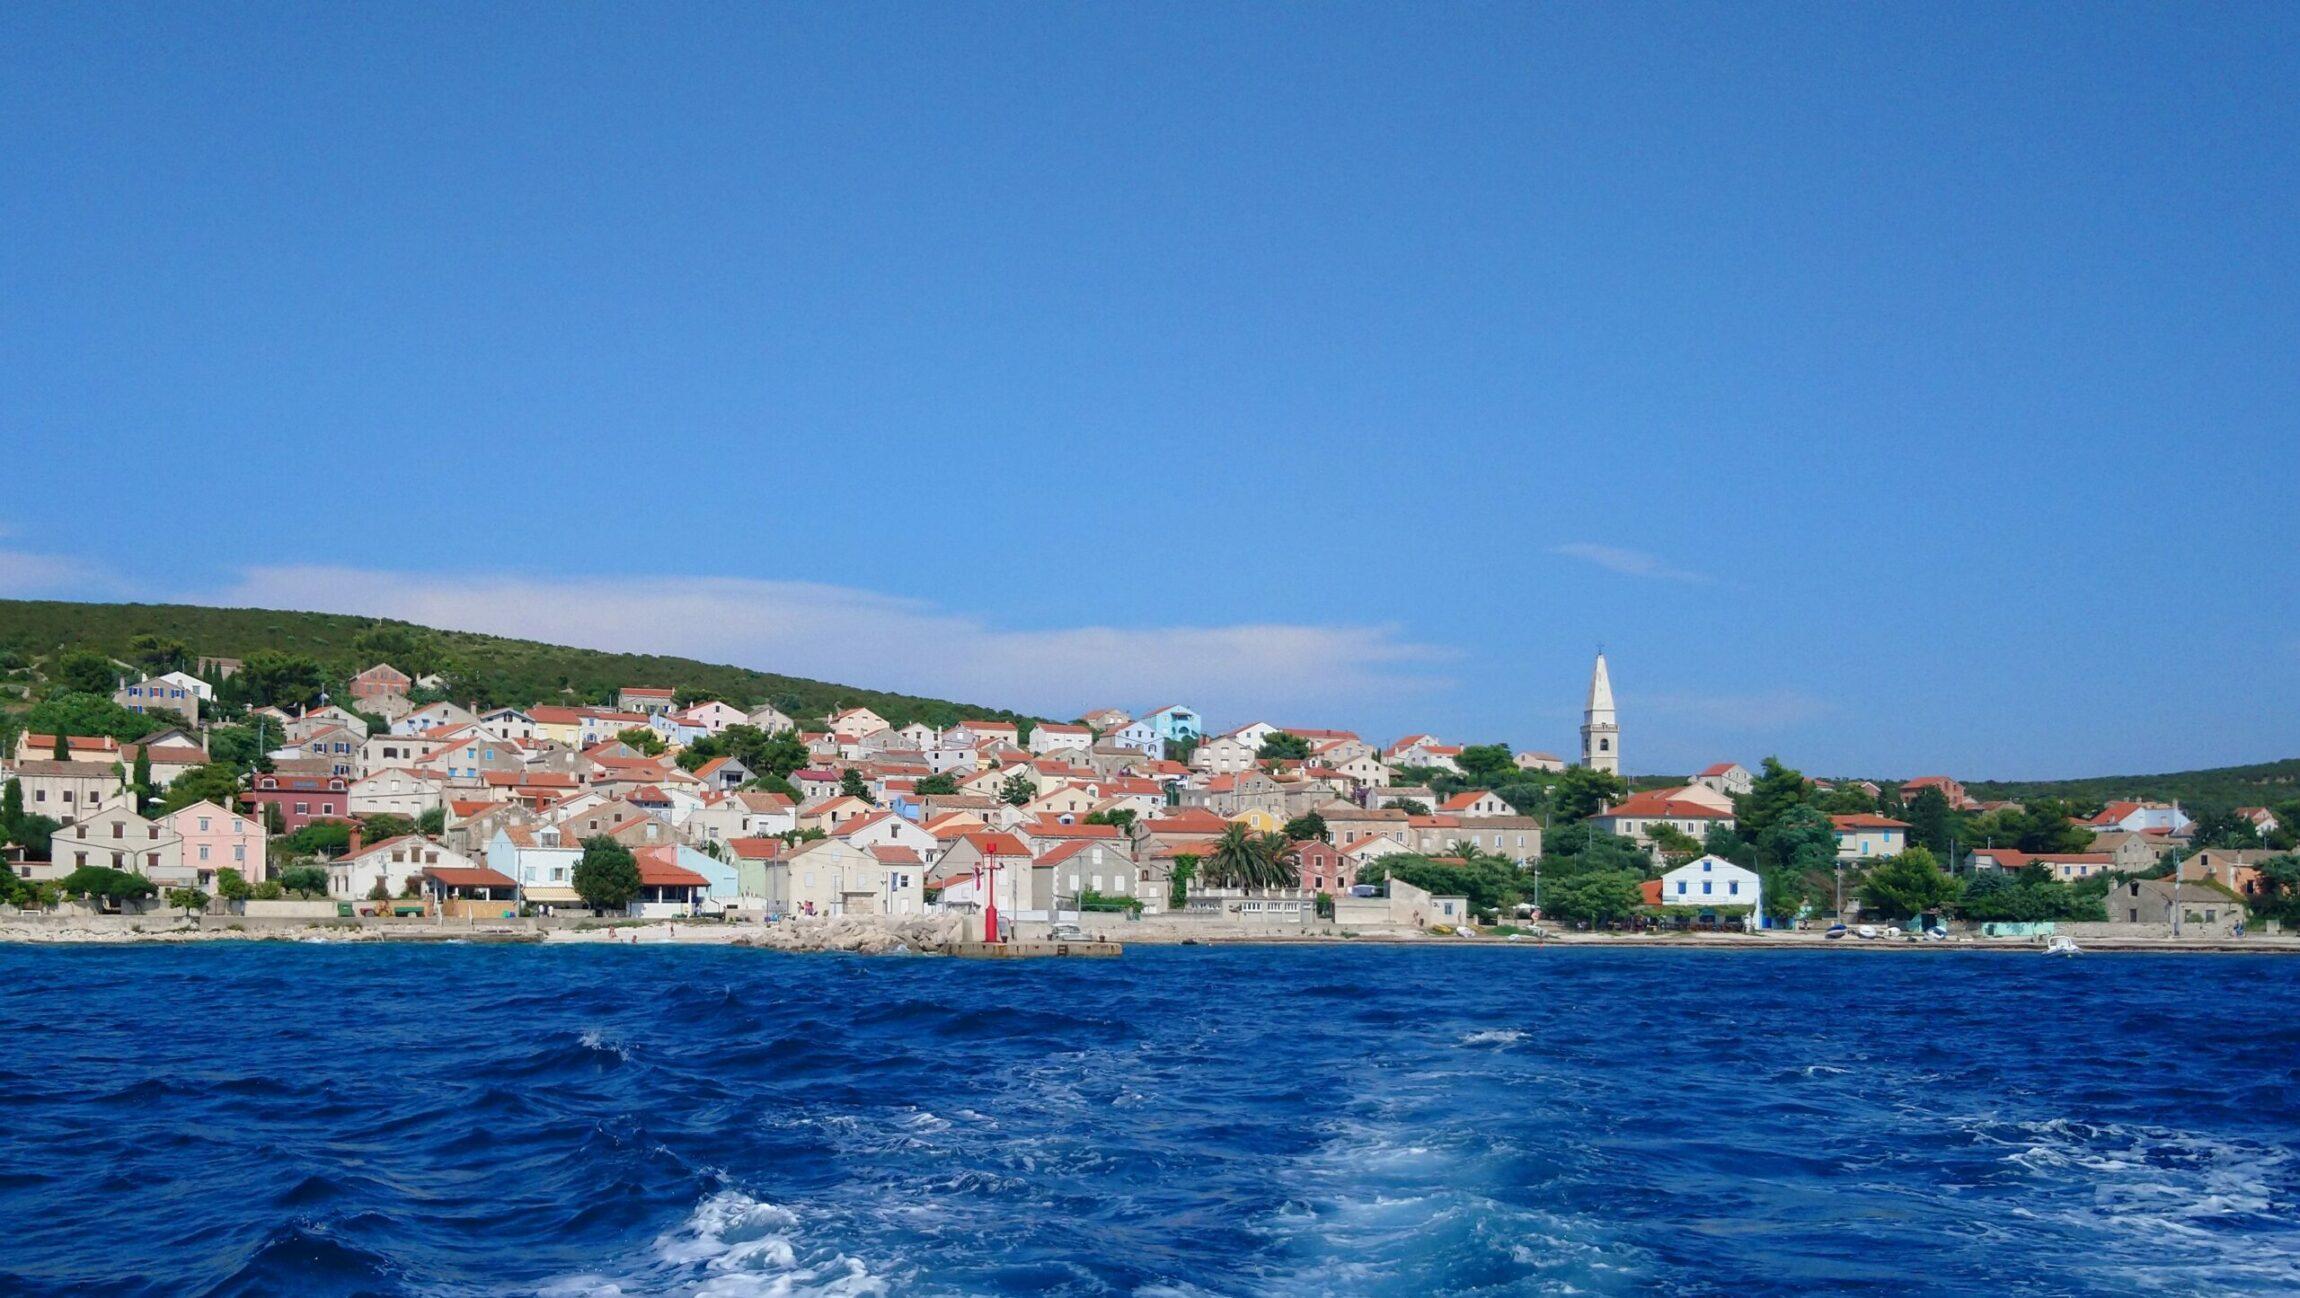 Turning Unije (Croatia) into an energy independent island